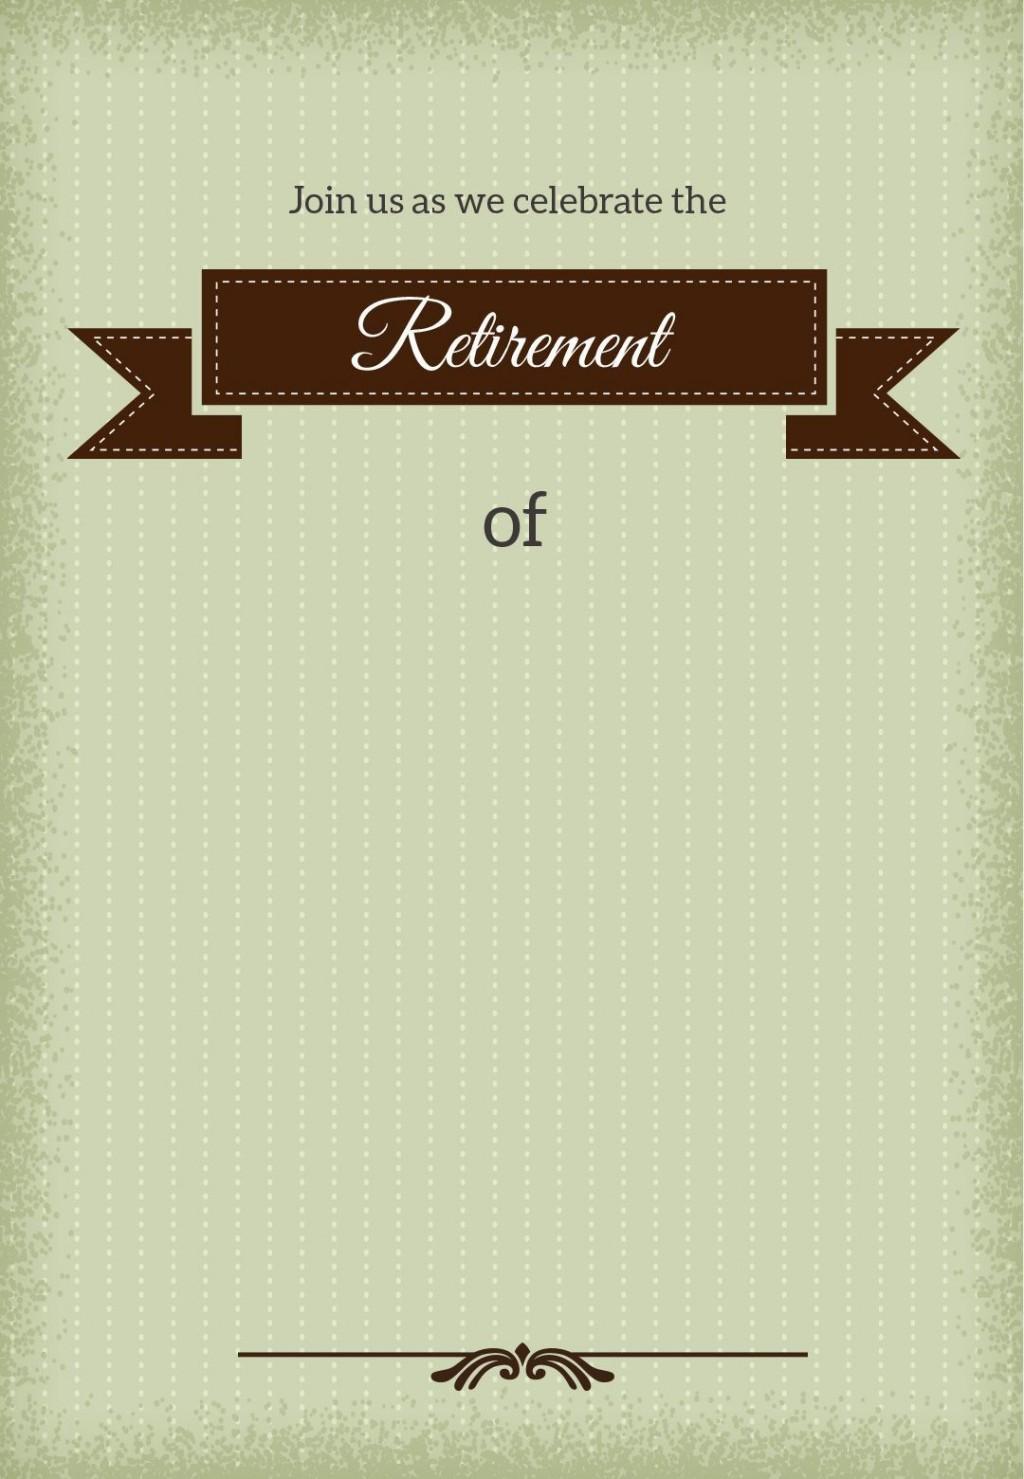 004 Fantastic Retirement Party Invitation Template Free Highest Quality  M WordLarge